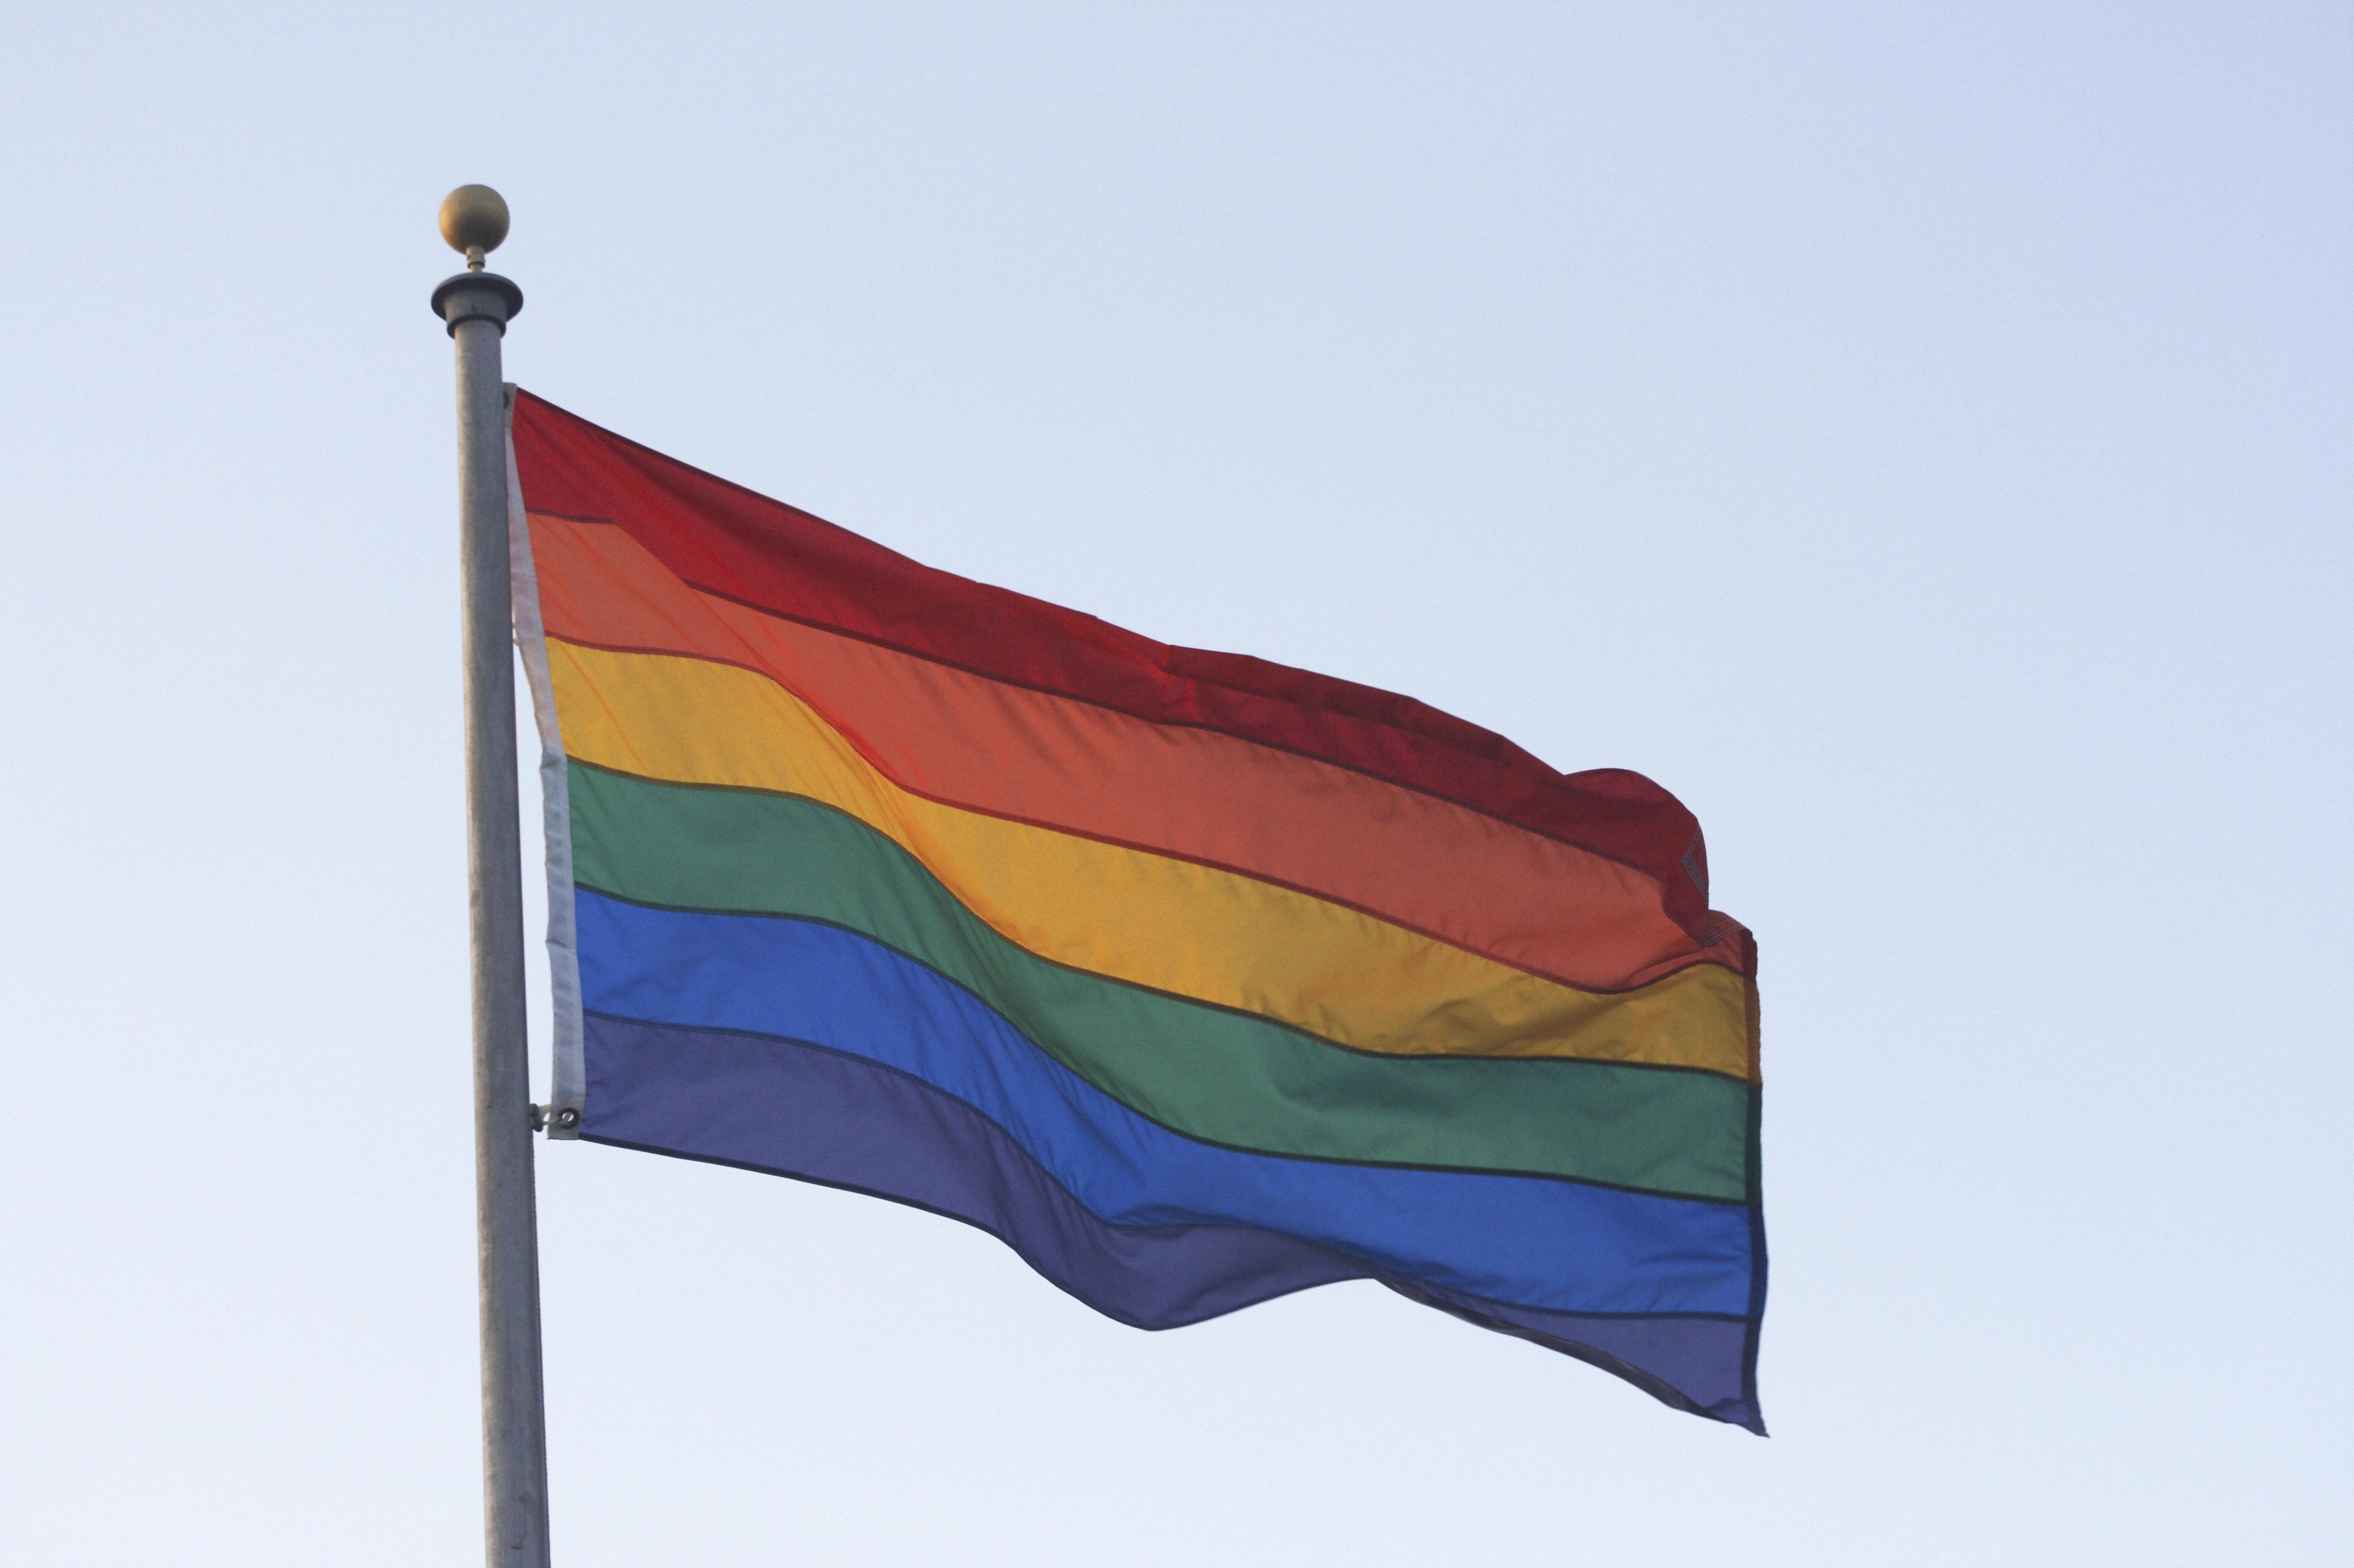 Malta Becomes First European Nation To Ban Gay Conversion